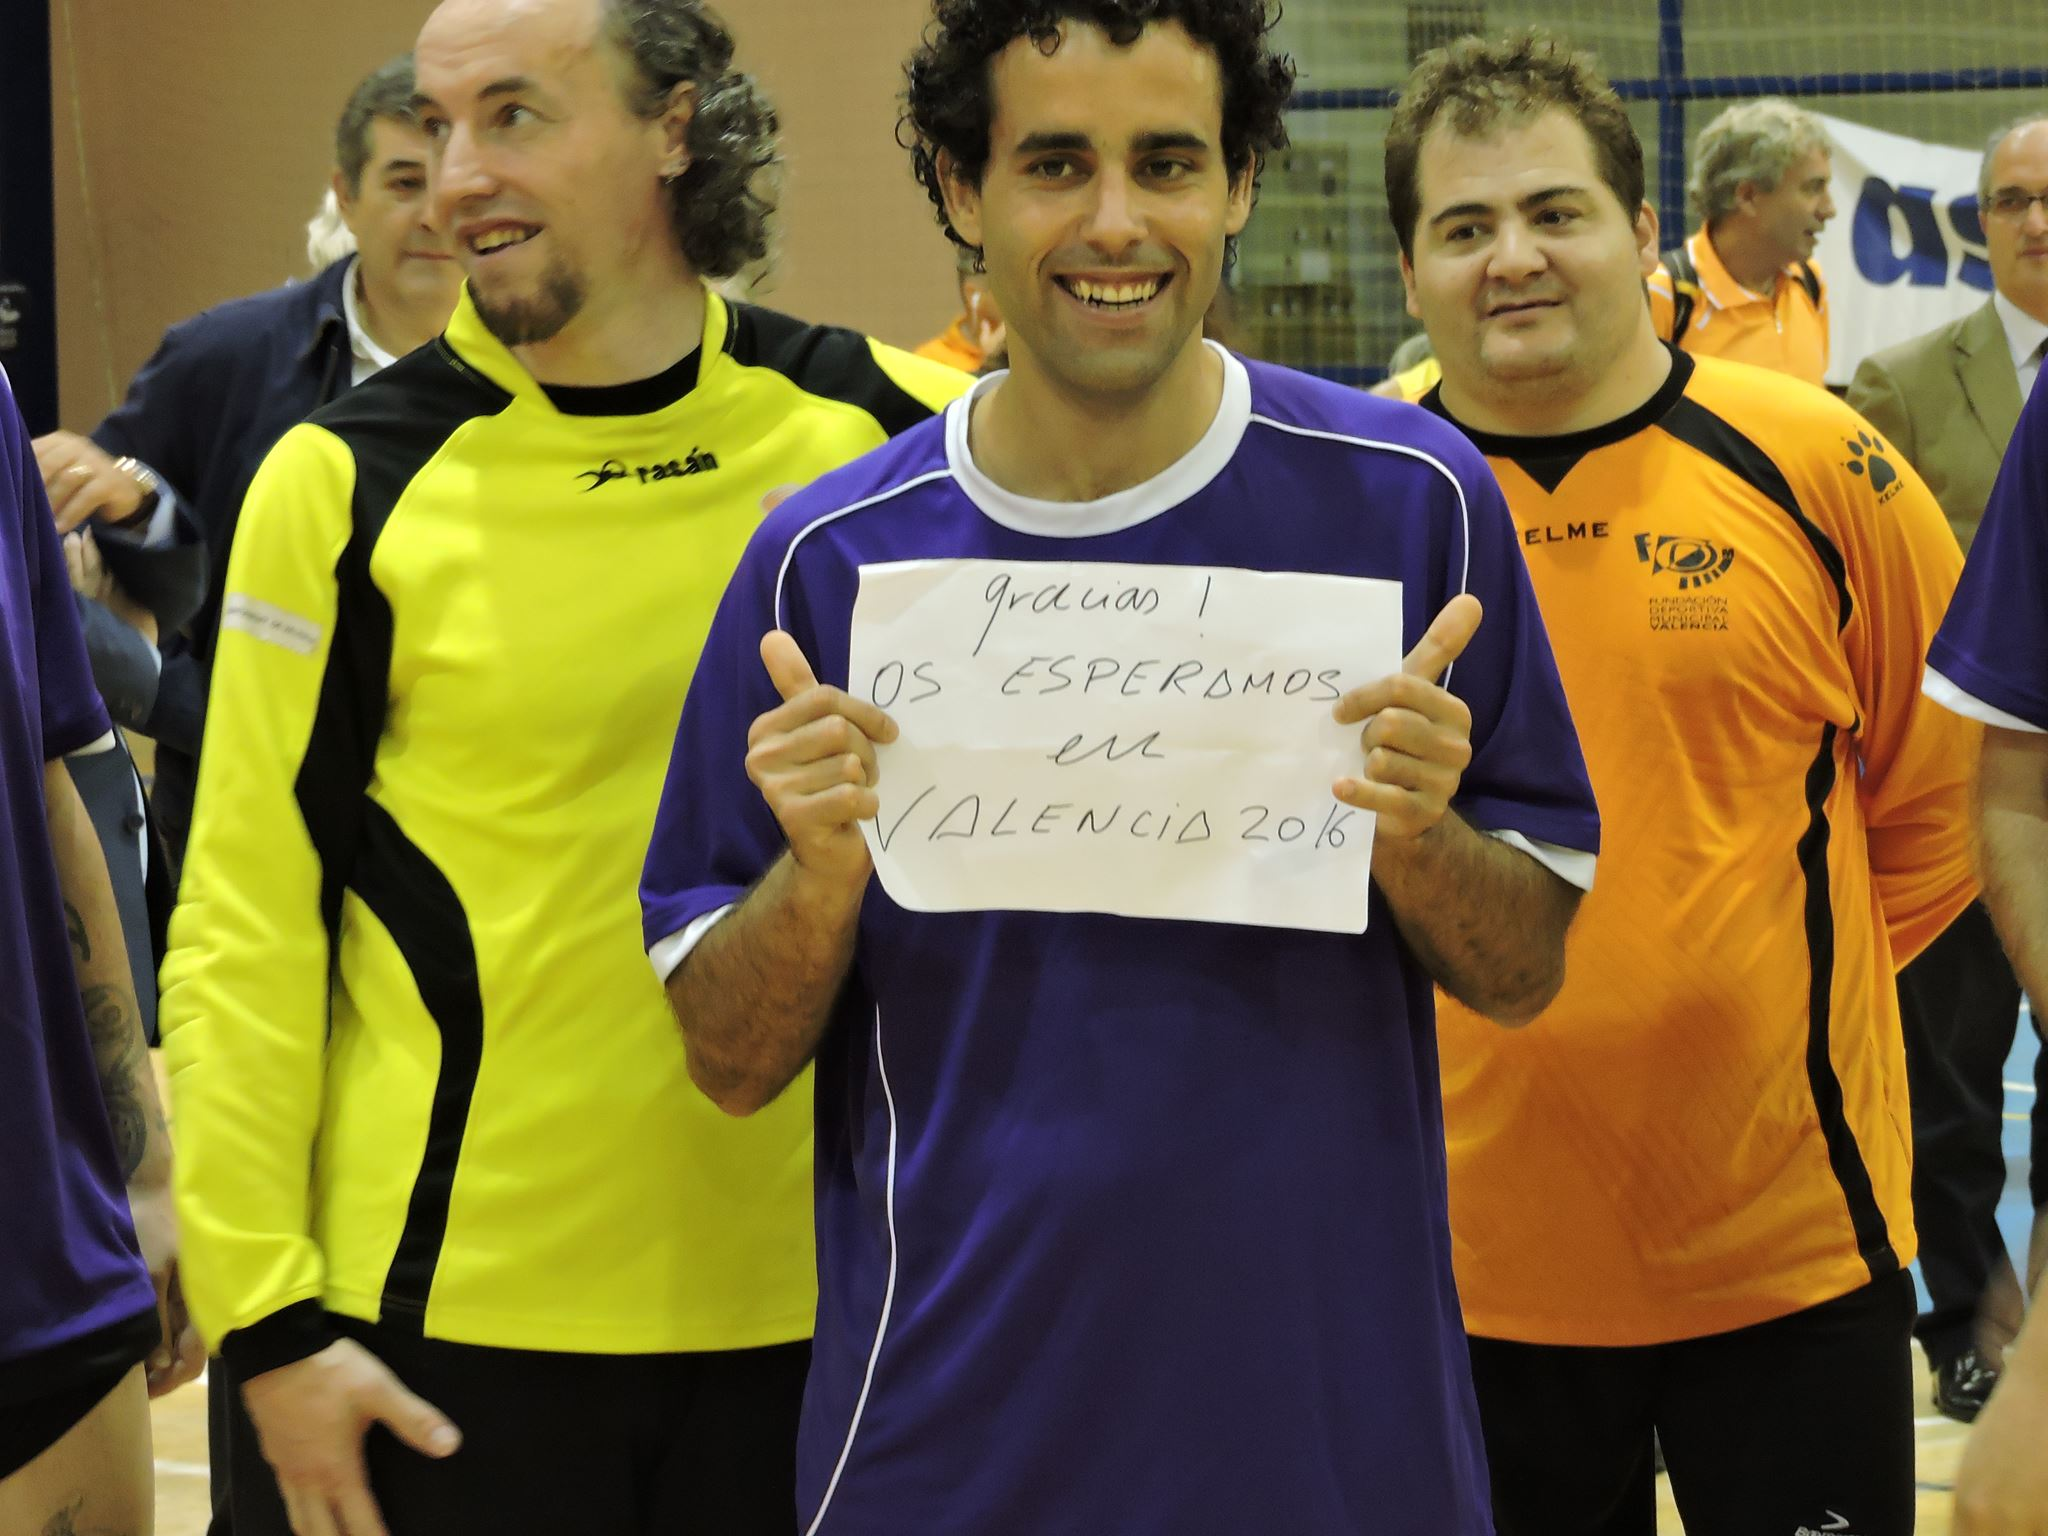 Jugadores del equipo Alter Valencia / Foto: Ximo Gisbert Hidalgo